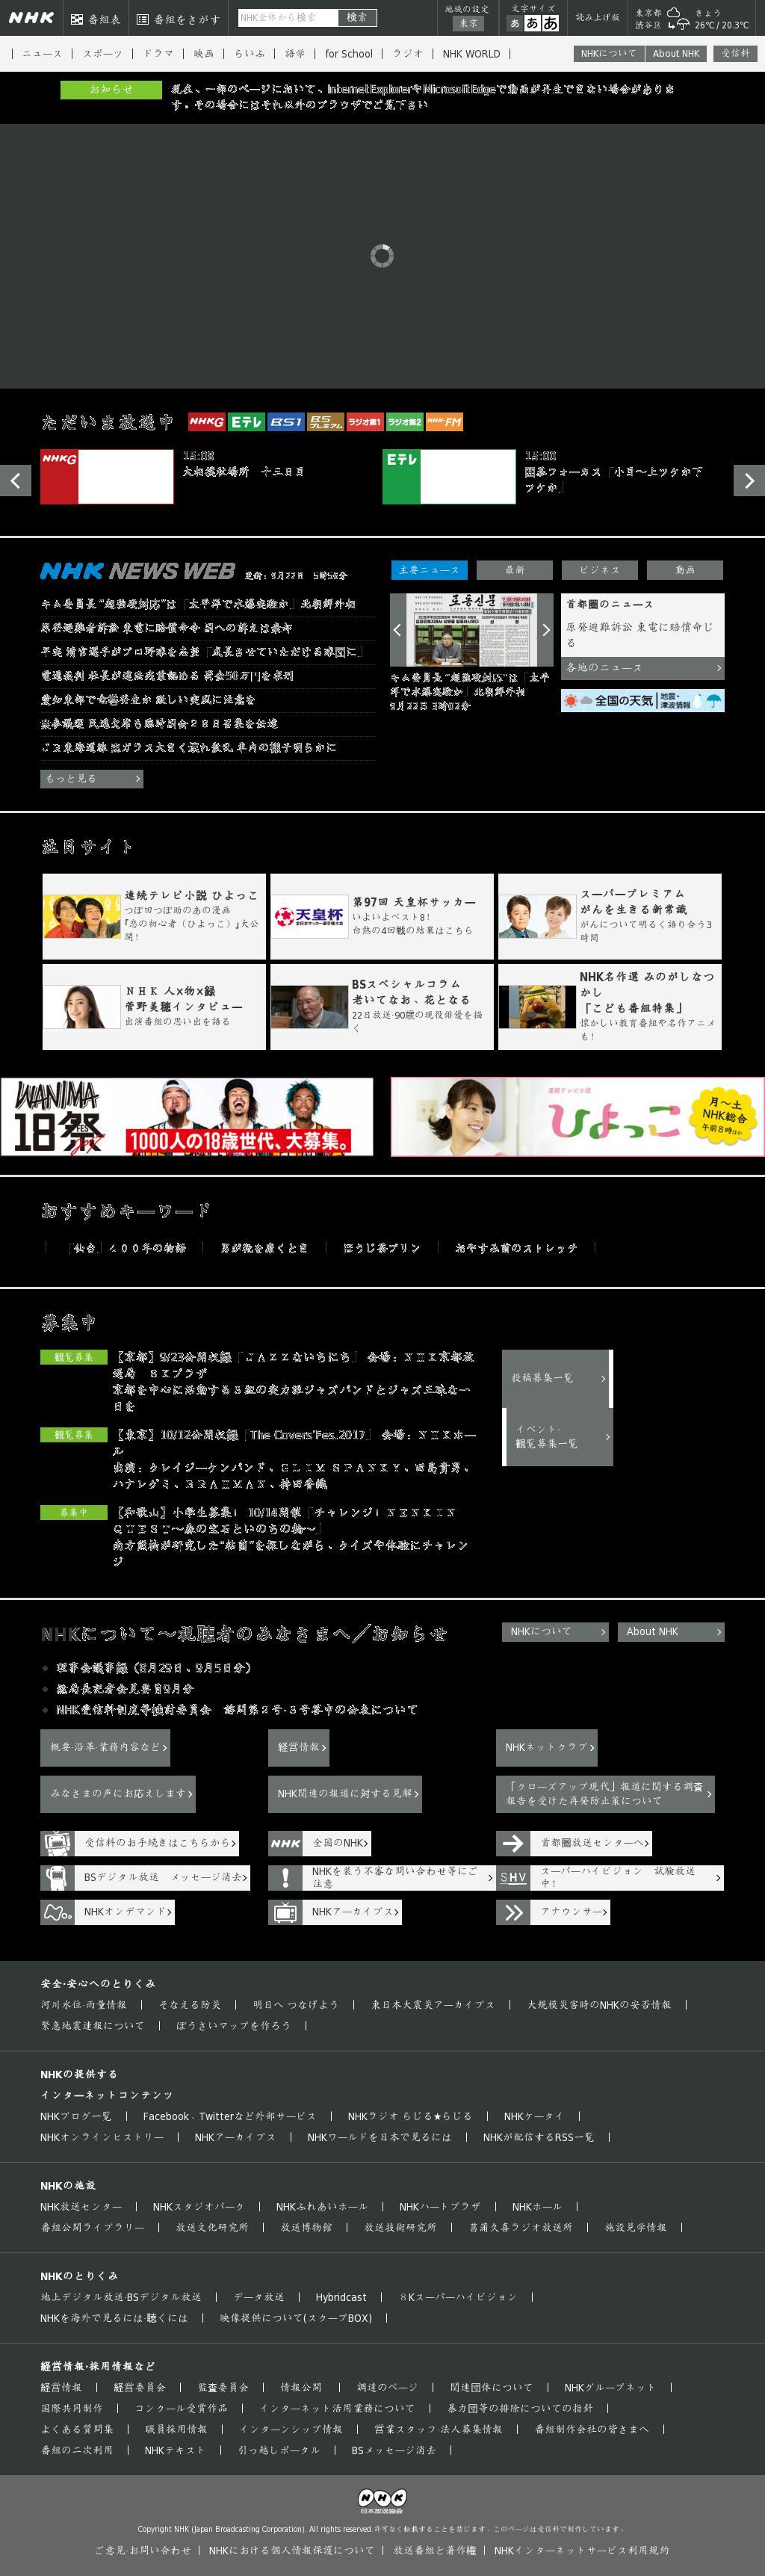 NHK Online at Friday Sept. 22, 2017, 6:17 a.m. UTC